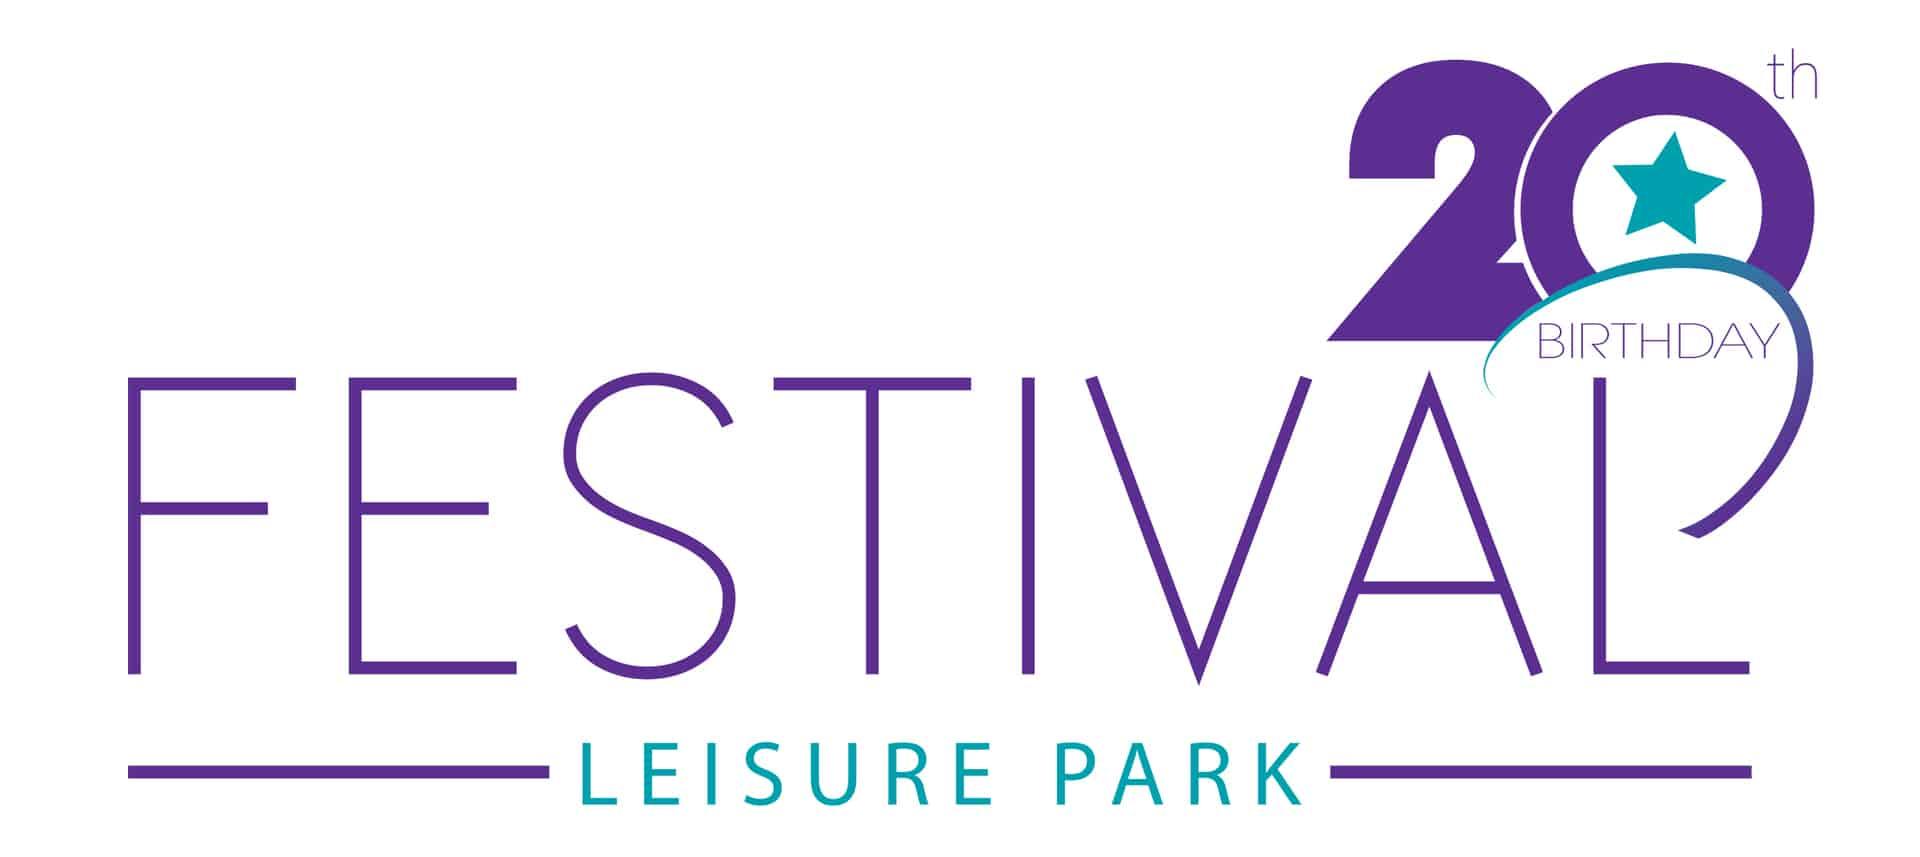 Basildon Festival Leisure Park